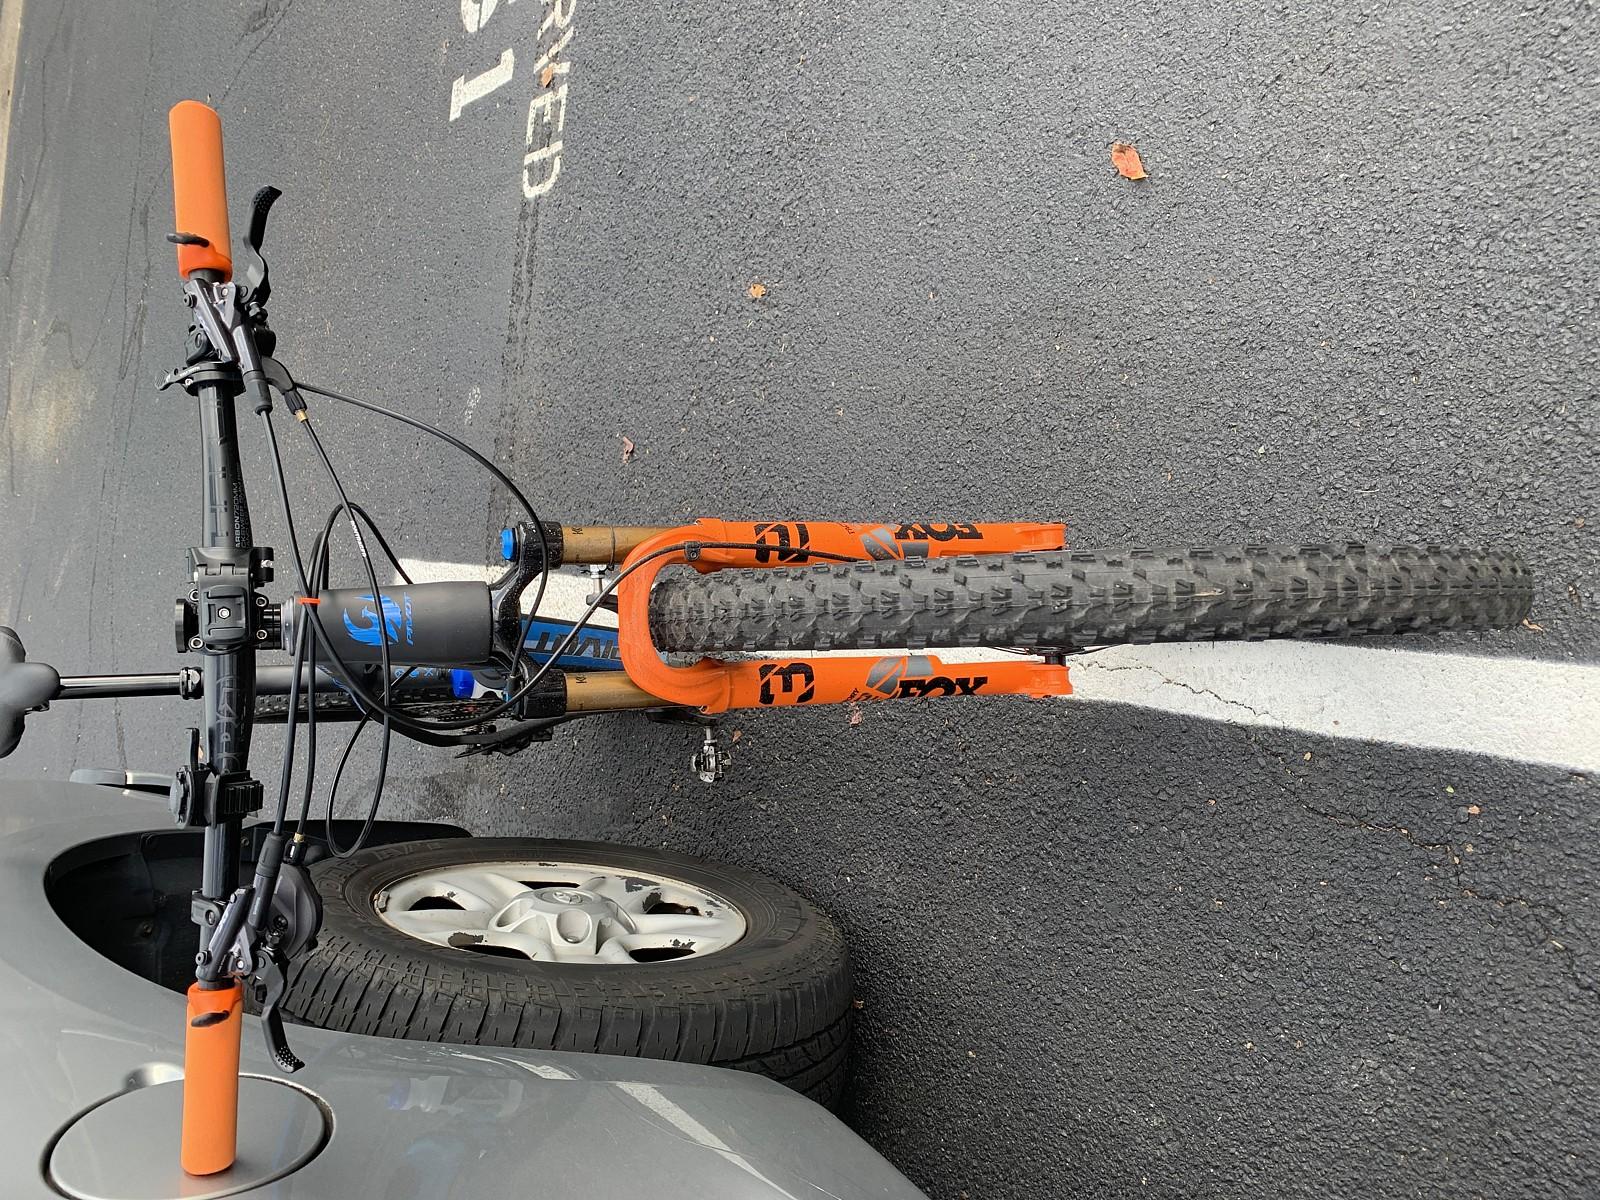 6AF979AB-C1E2-467A-9FF6-C67E25948DA1 - Paul333 - Motocross Pictures - Vital MX